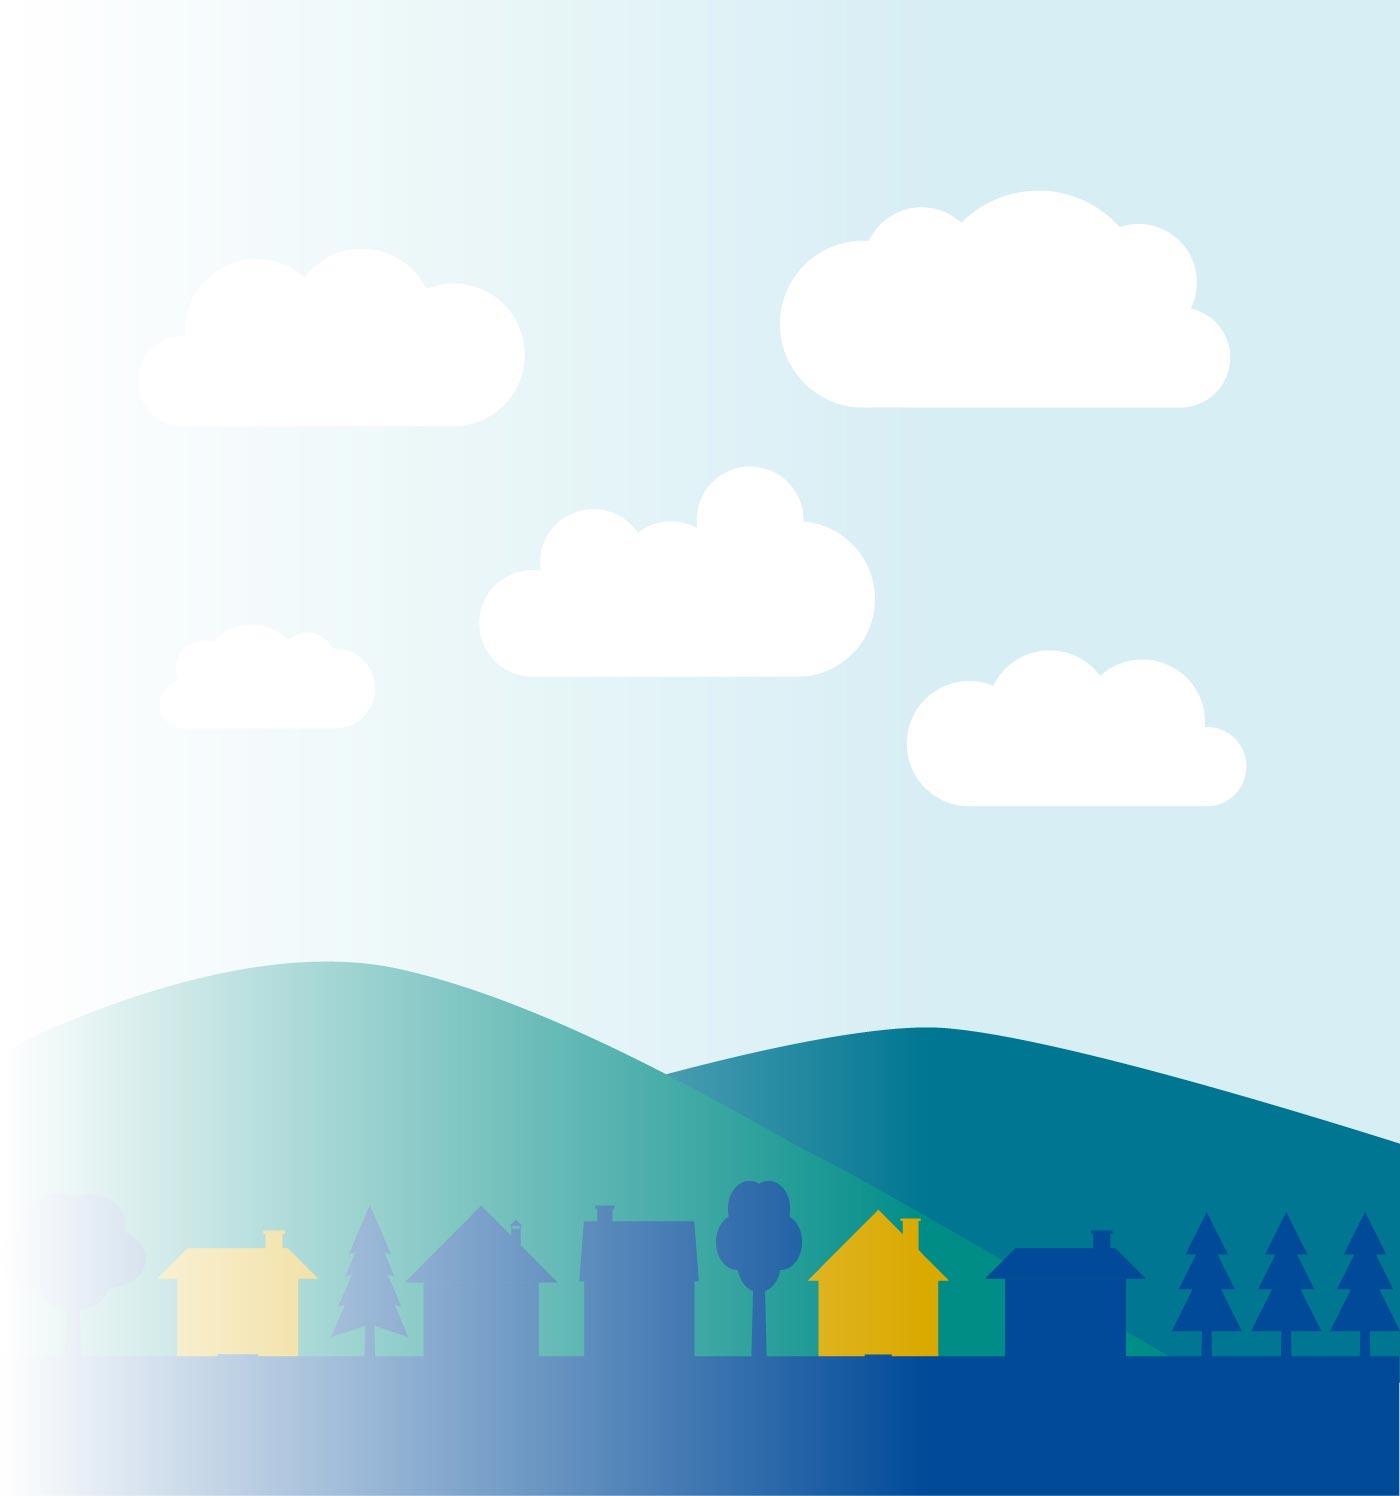 housing voucher image